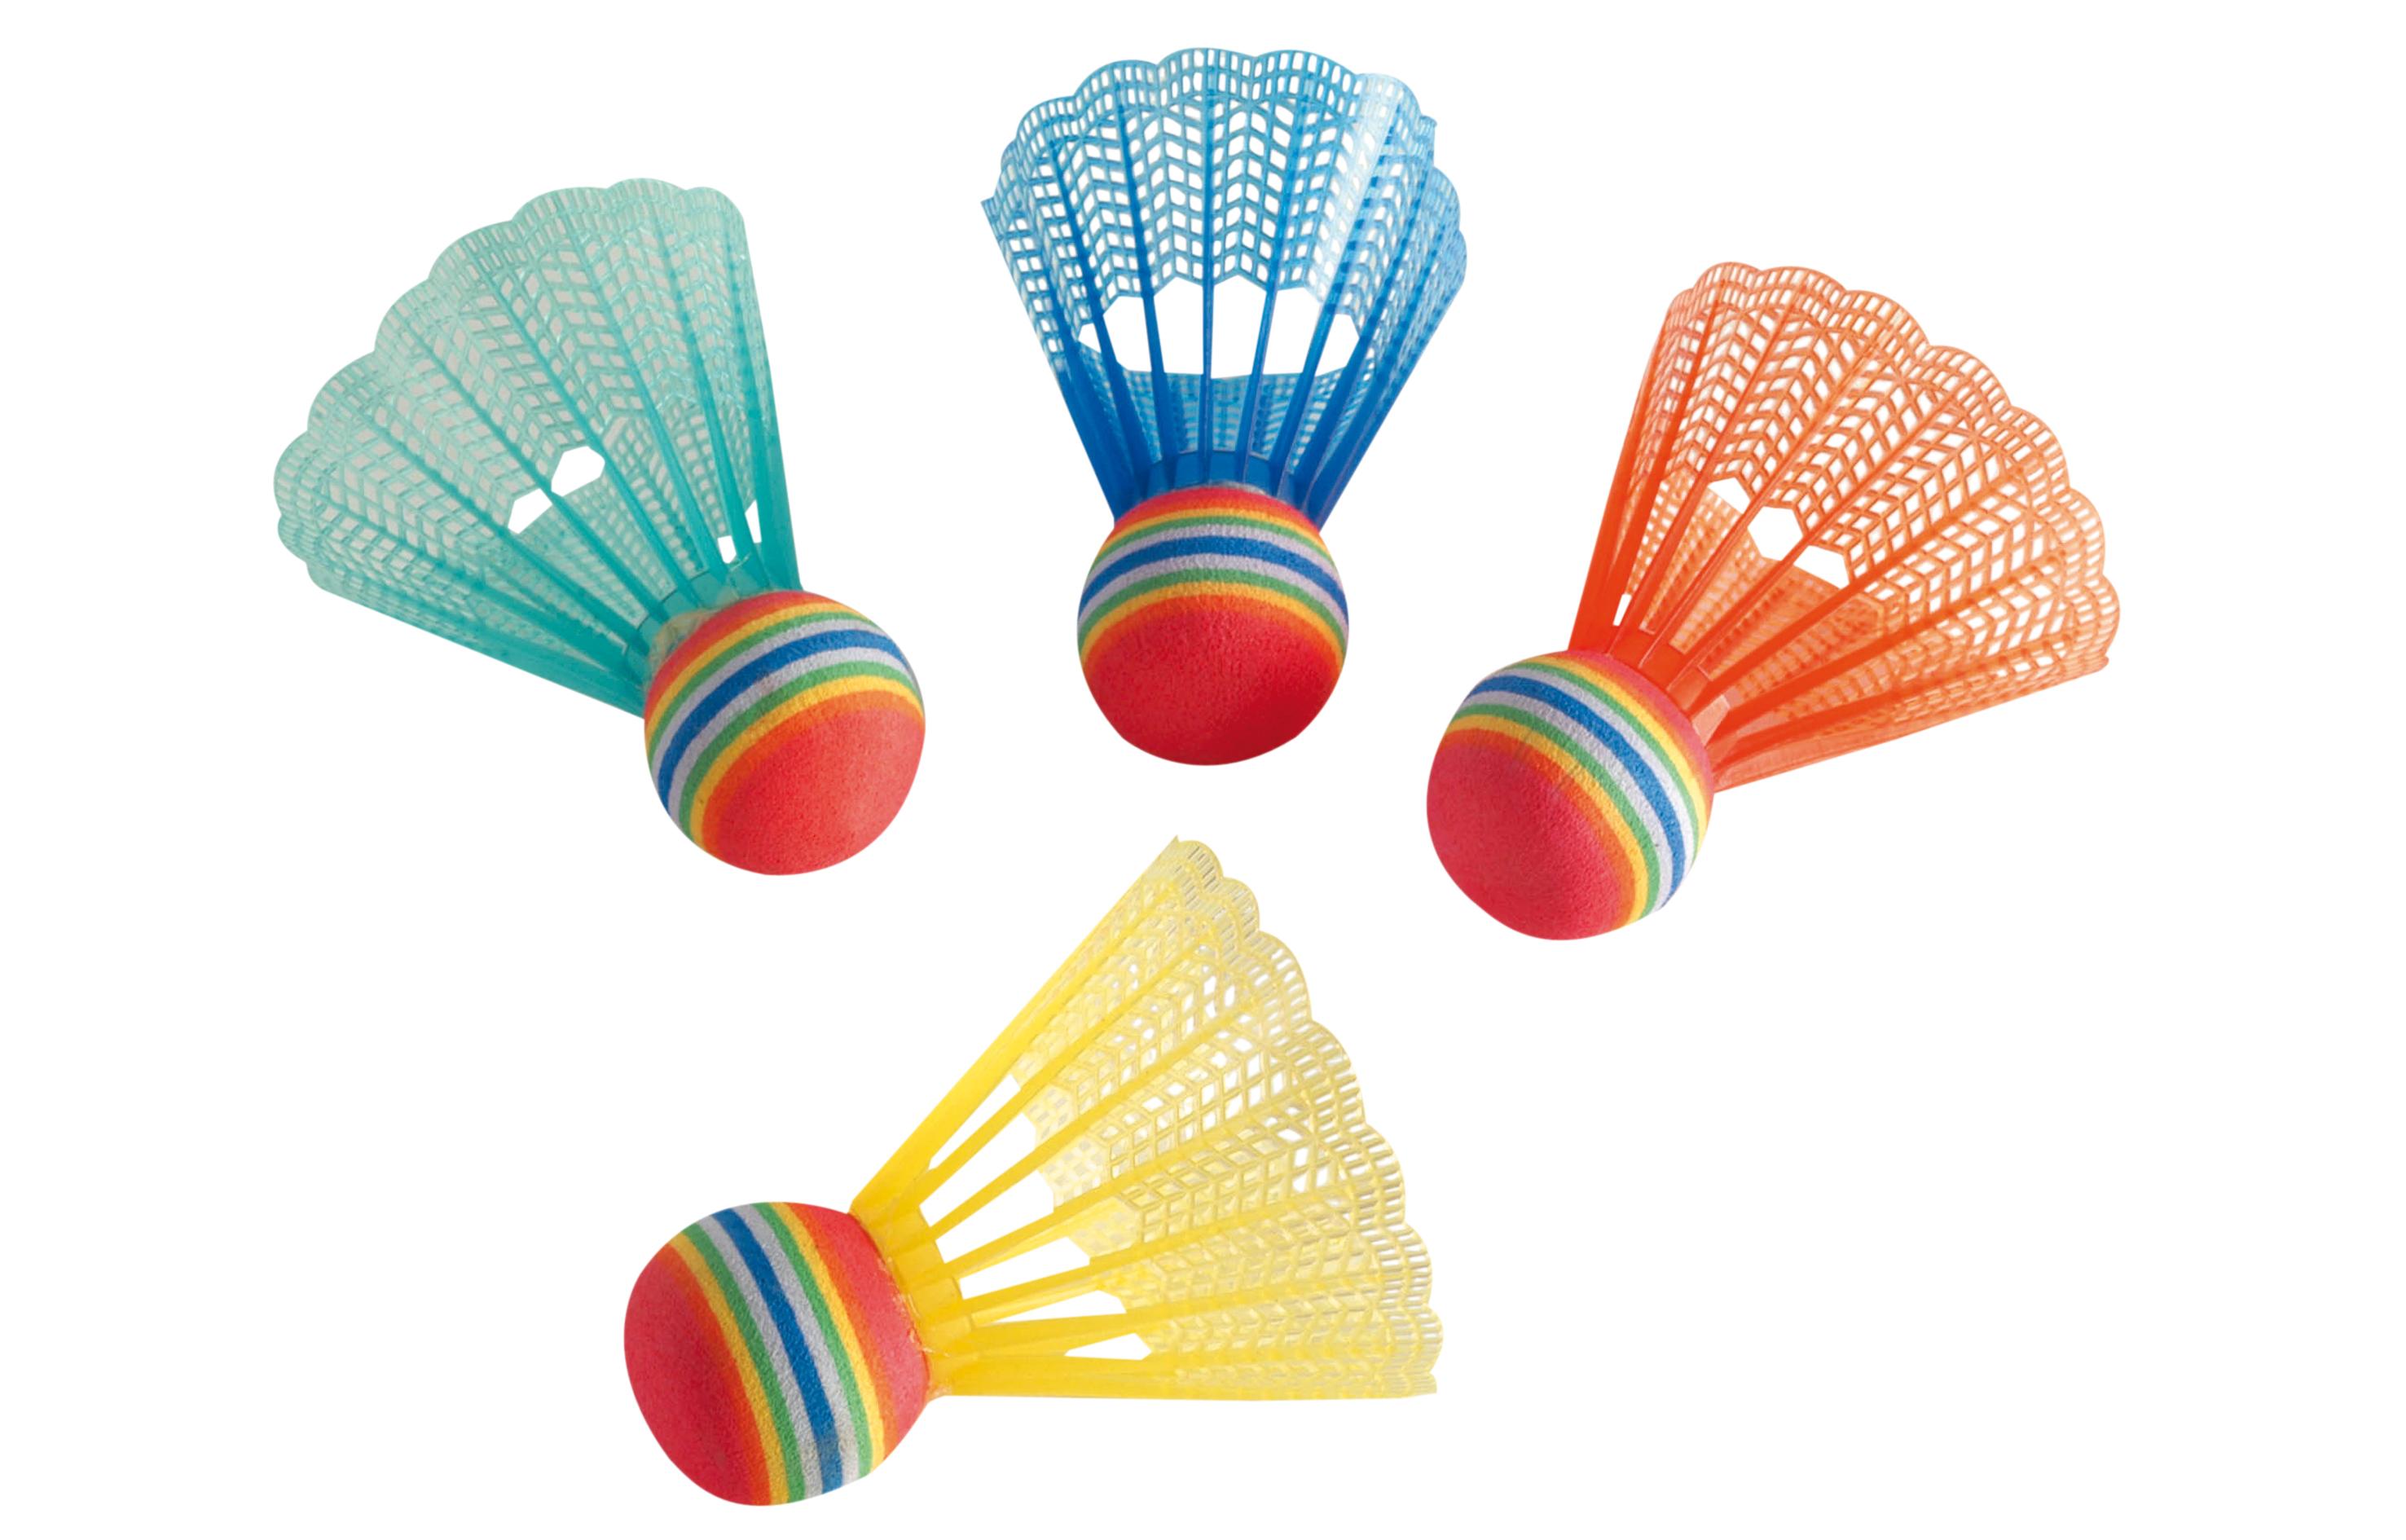 4 Stück Federbälle Fun Hudora 76047 Badminton Sport Freizeit Park Strand Ball Badminton